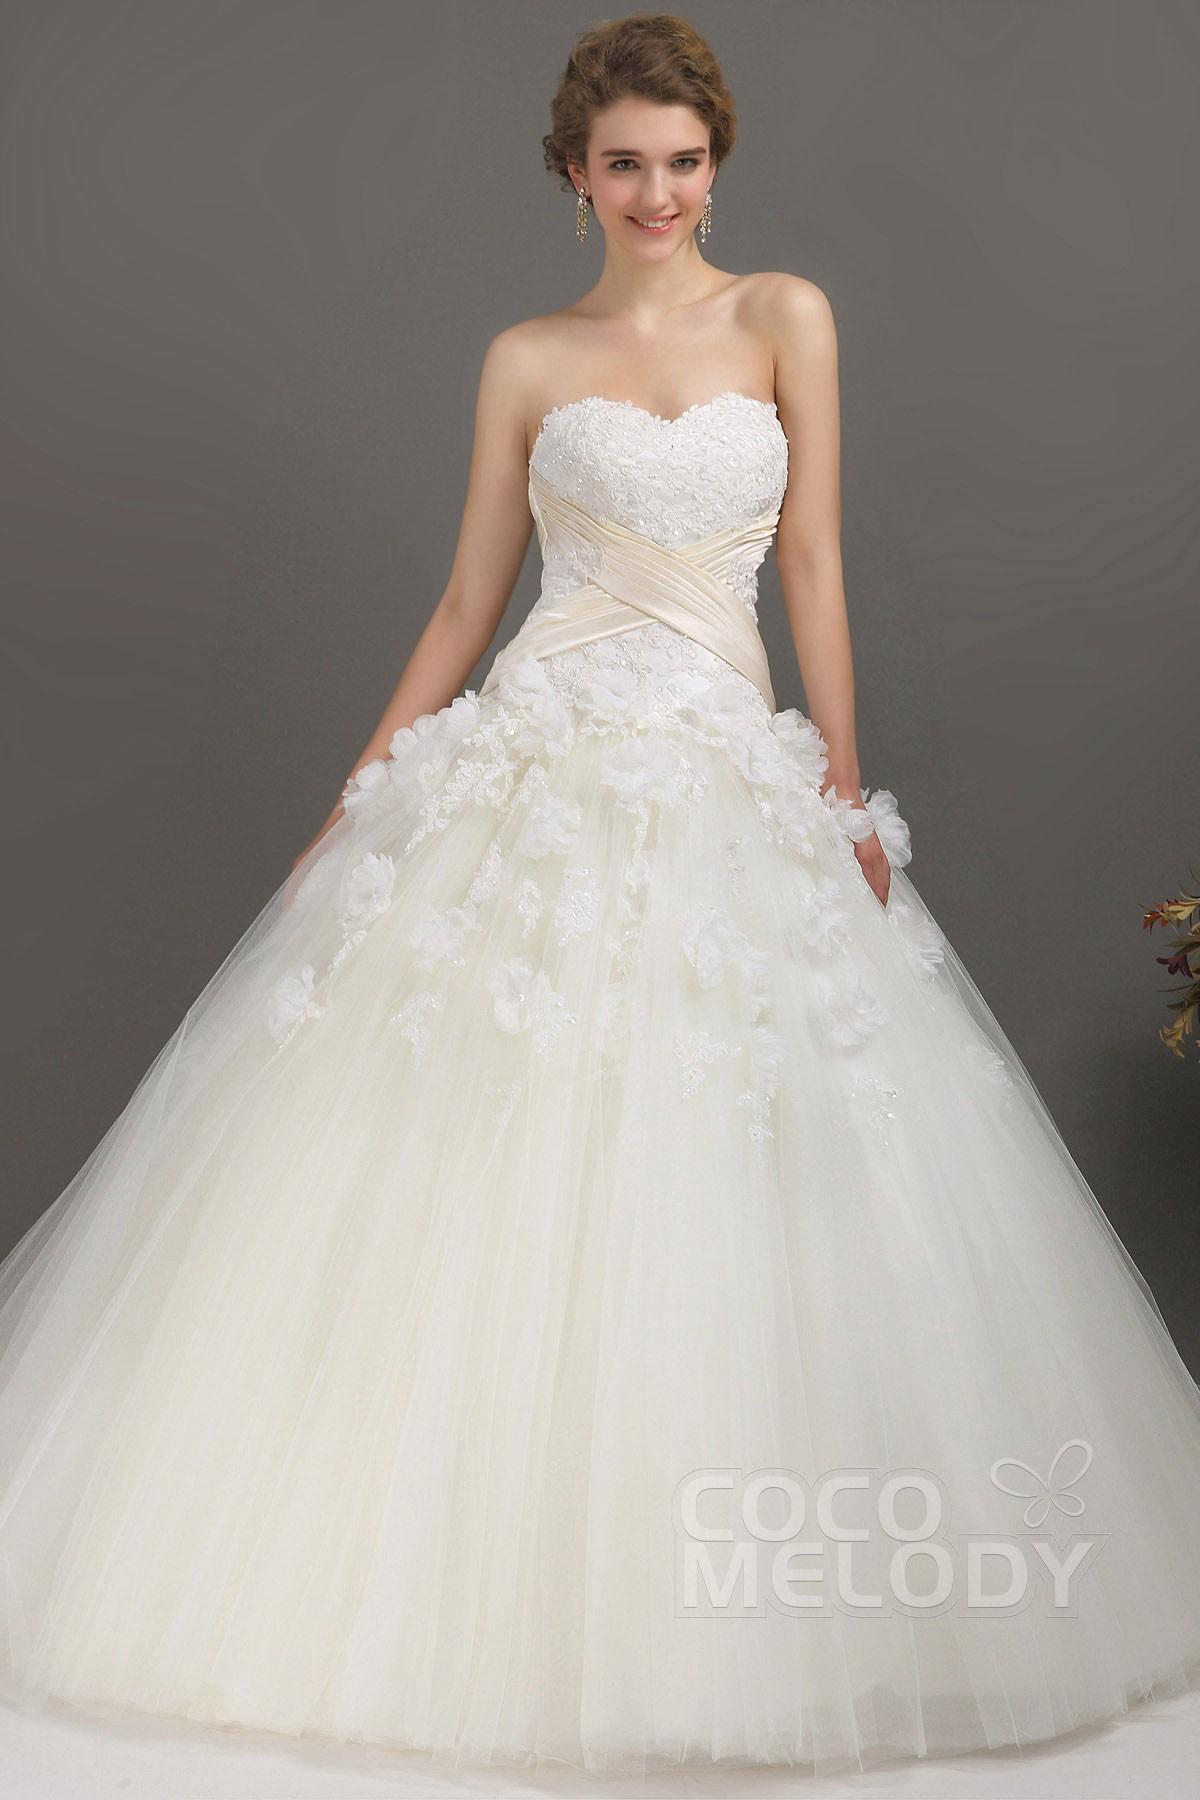 Cocomelody: Princess Sweetheart Chapel Train Tulle Wedding Dress ...